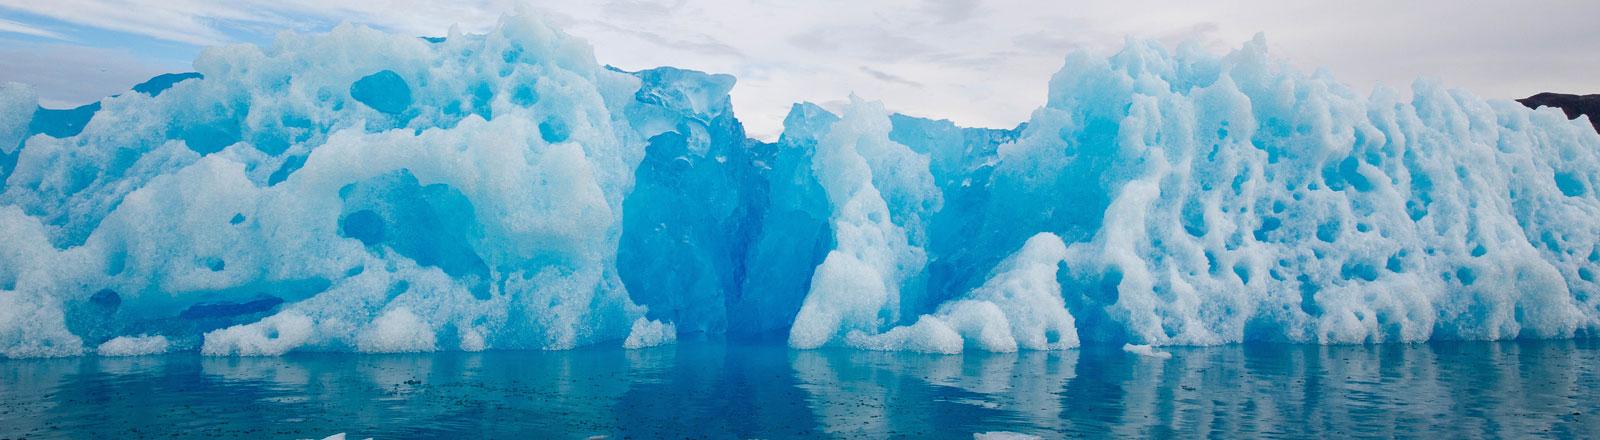 Eis in Südwest-Grönland (2014)